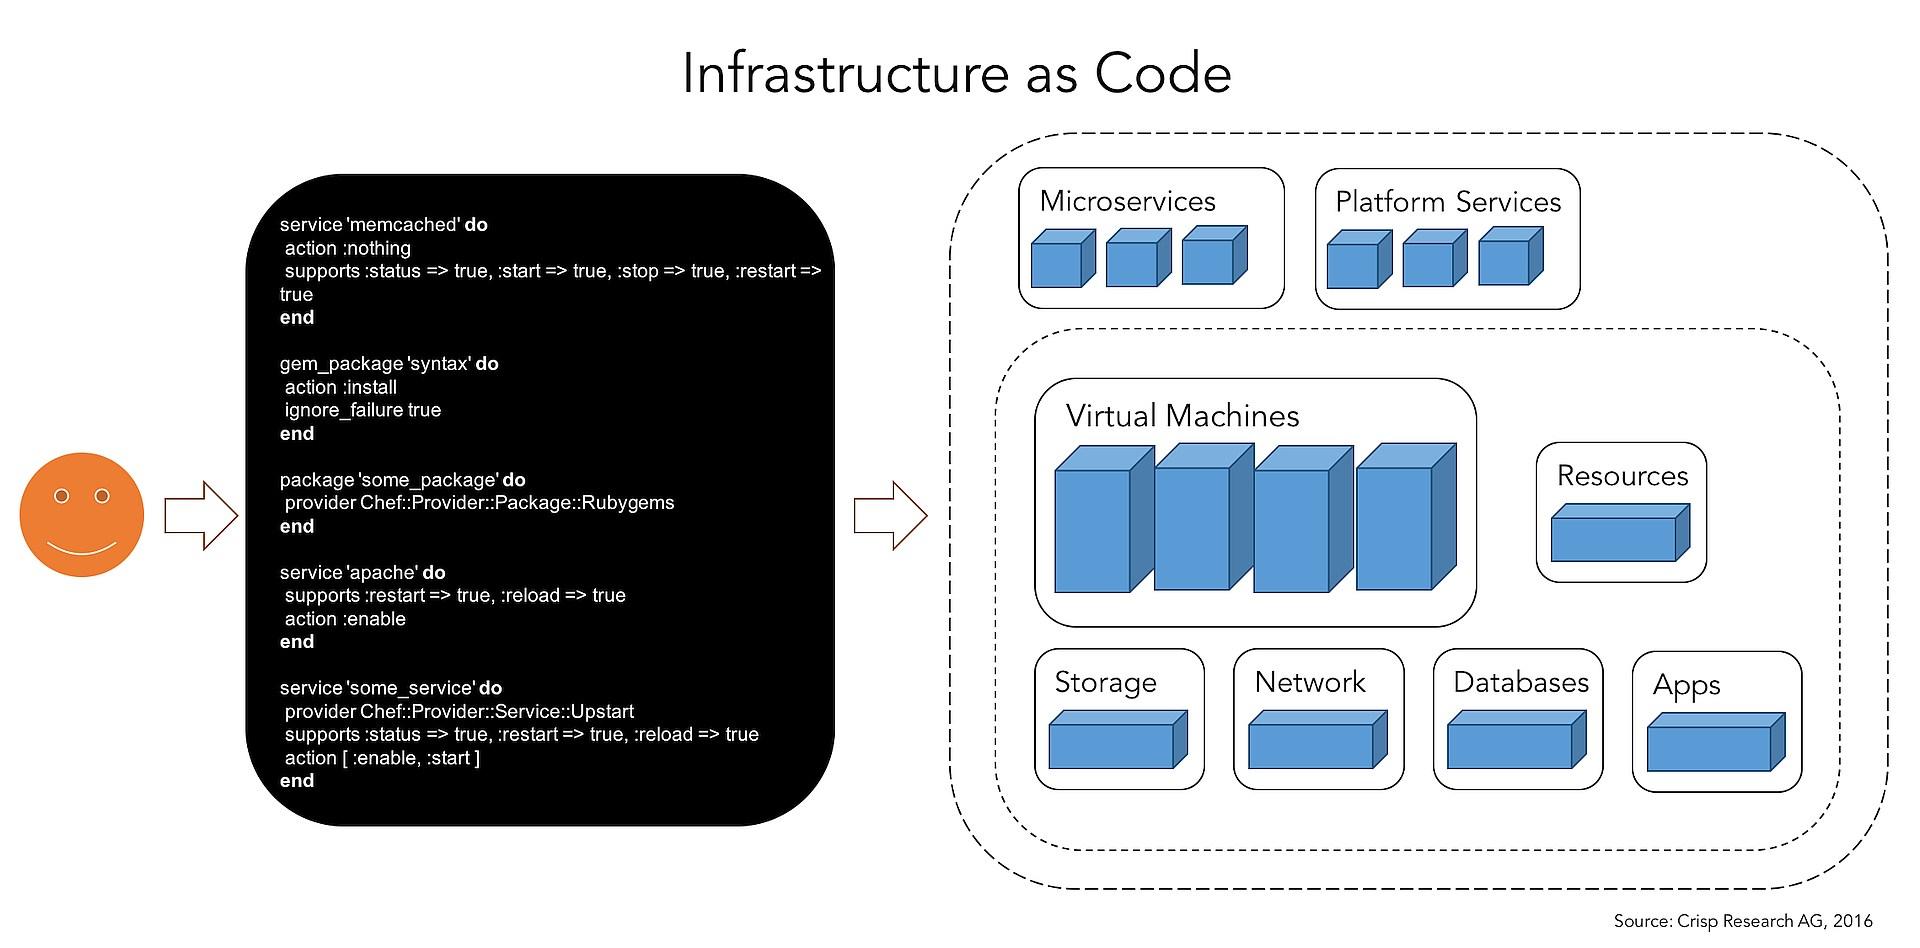 grafik crisp research infrastructure as code